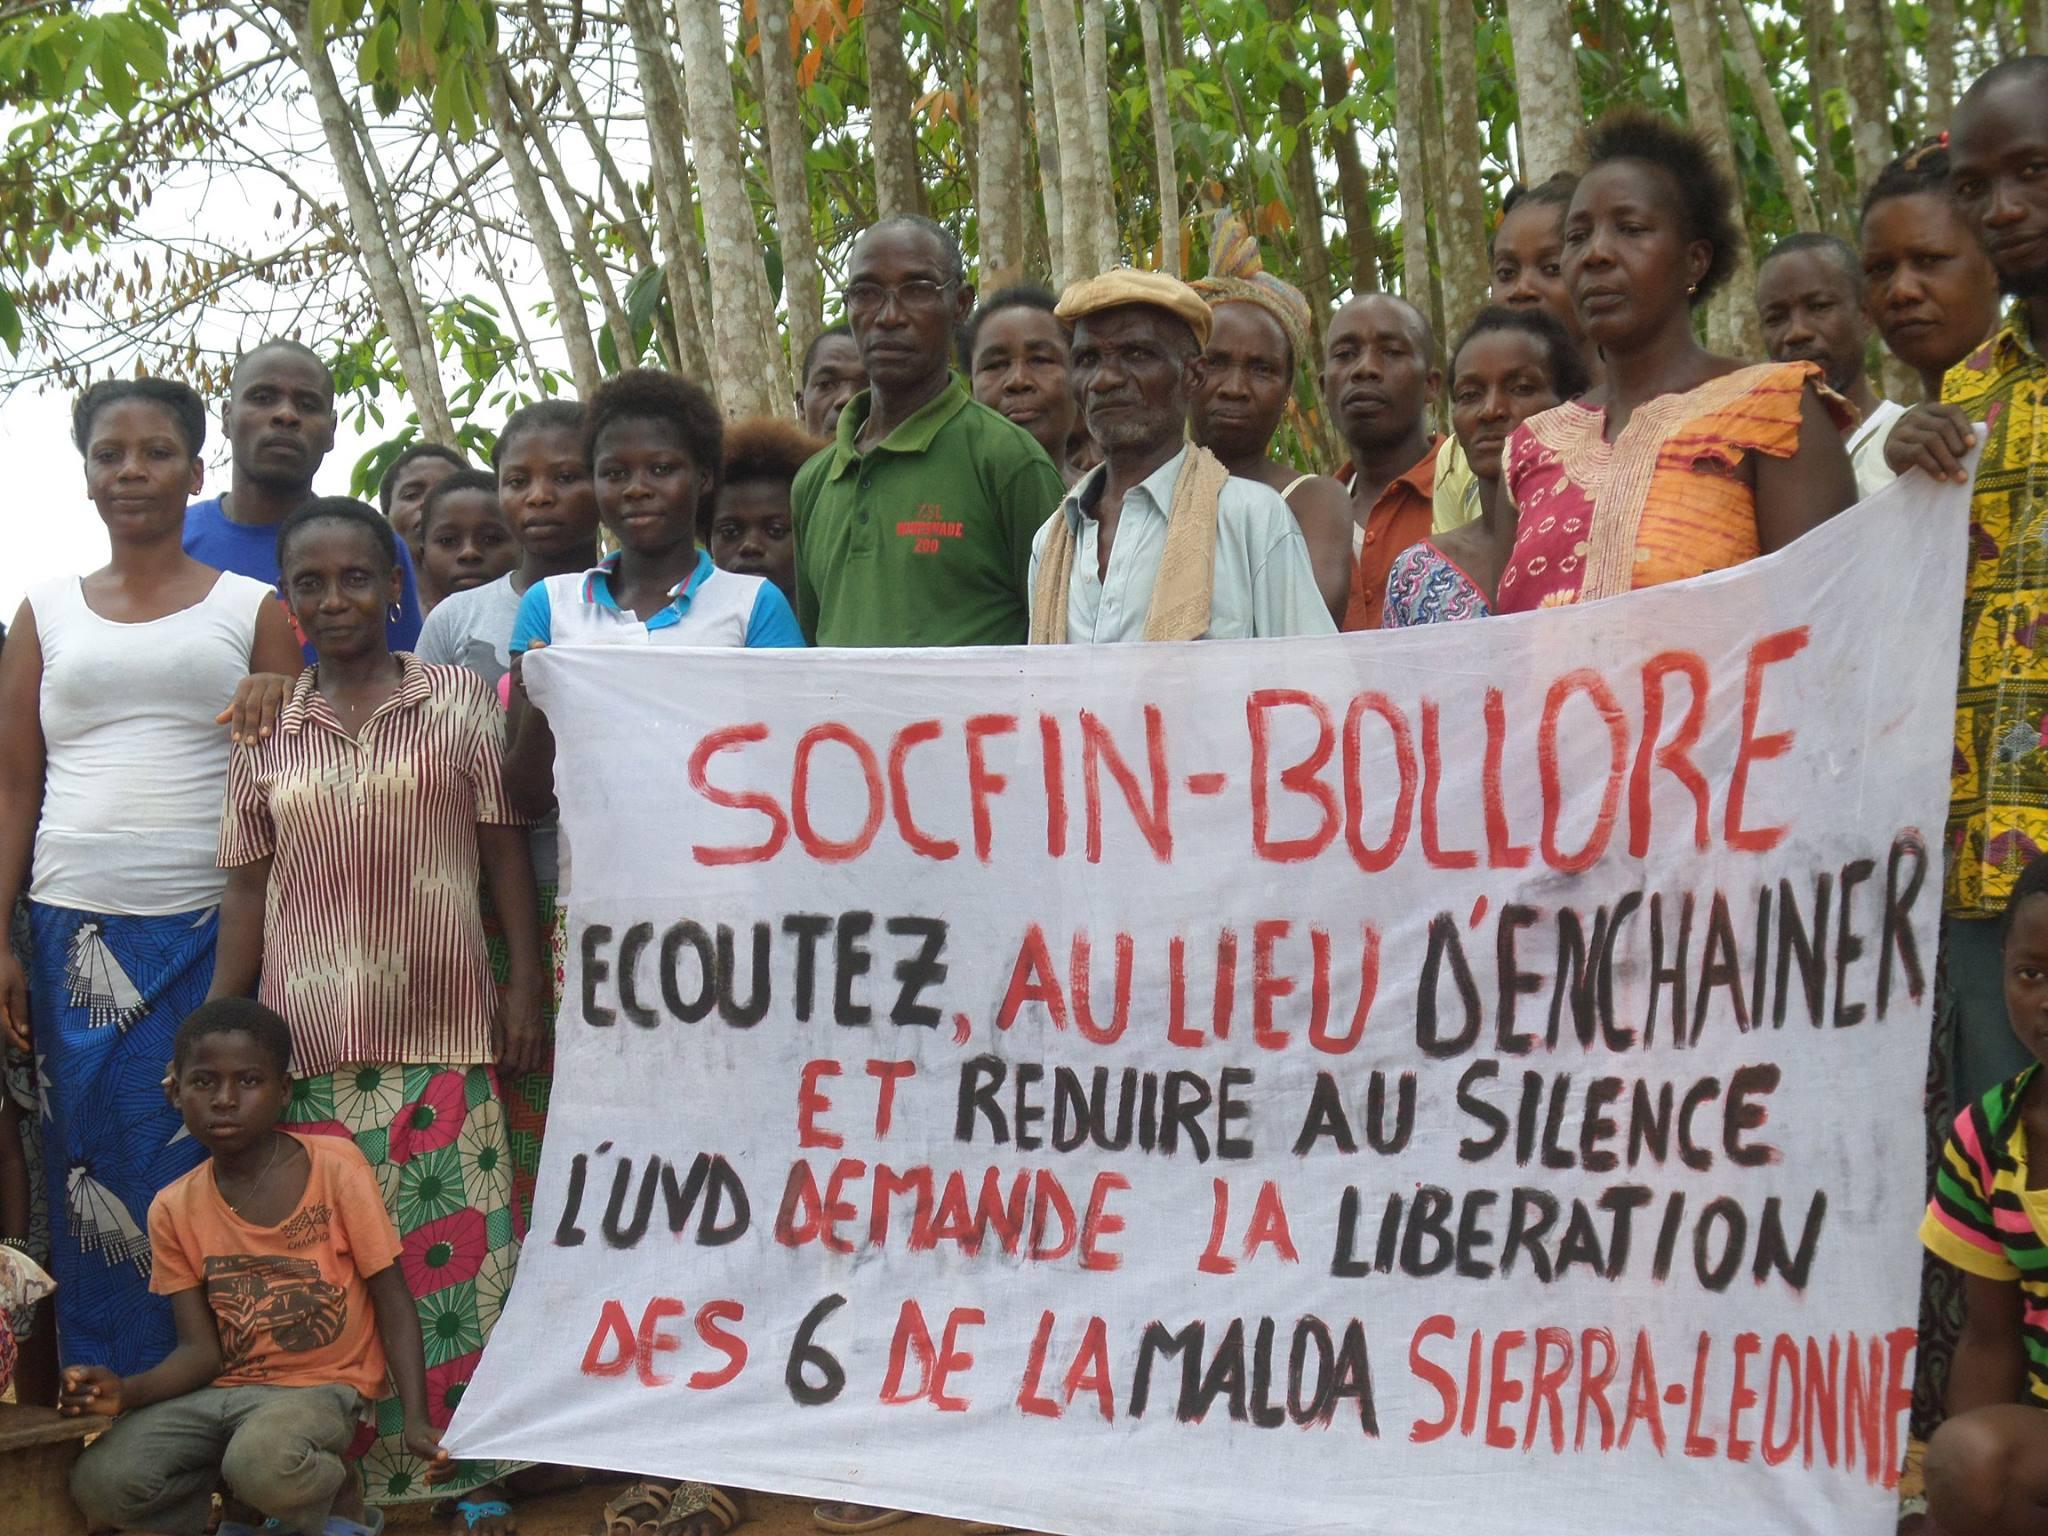 original_0-Côte_d_Ivoire_Solidarity_from_villagers_near_a_Socfin_plantation_in_Côte_d_Ivoire